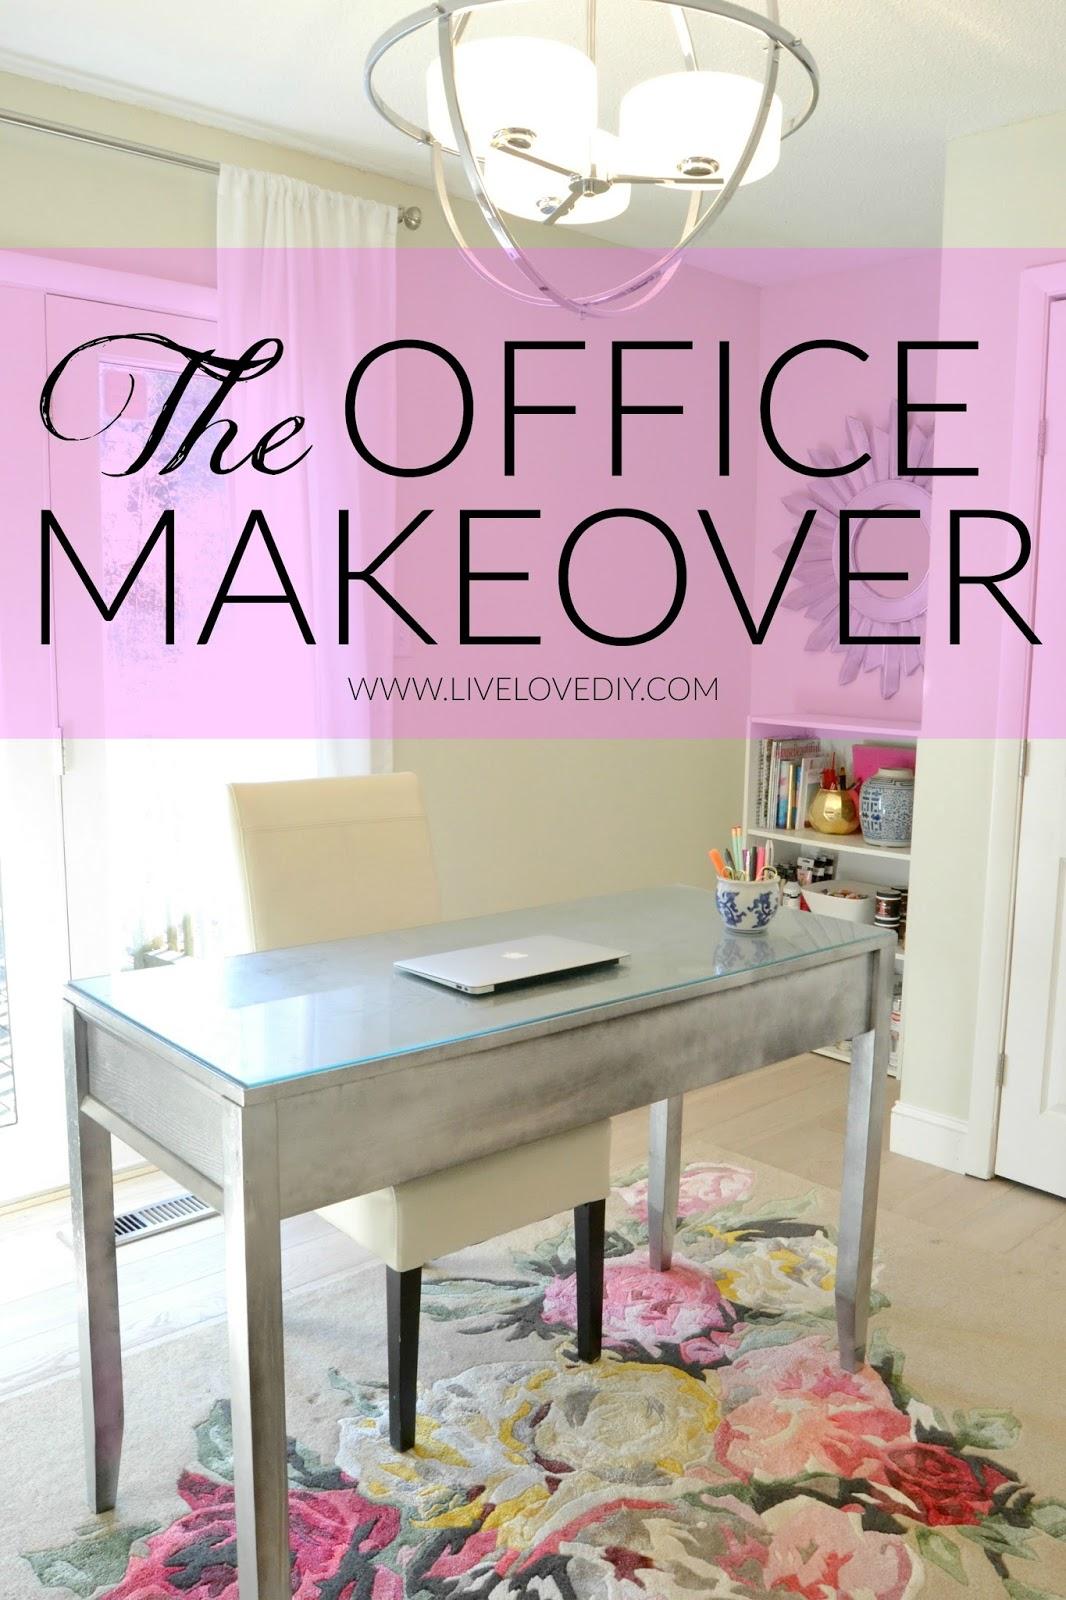 LiveLoveDIY Home Office Decorating Ideas My Latest Makeover